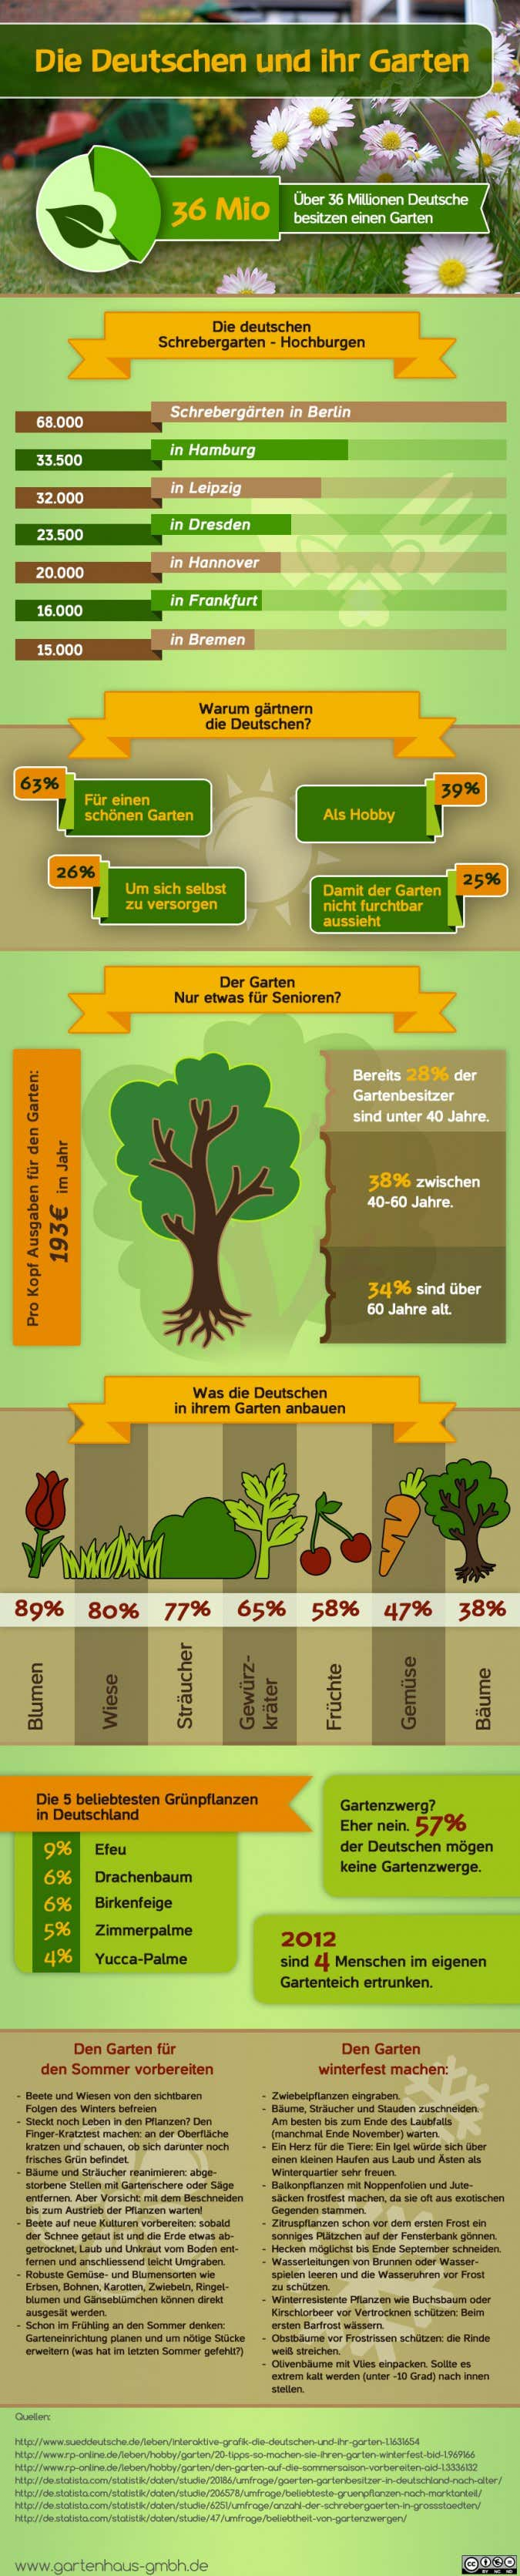 infografik-deutschen-garten